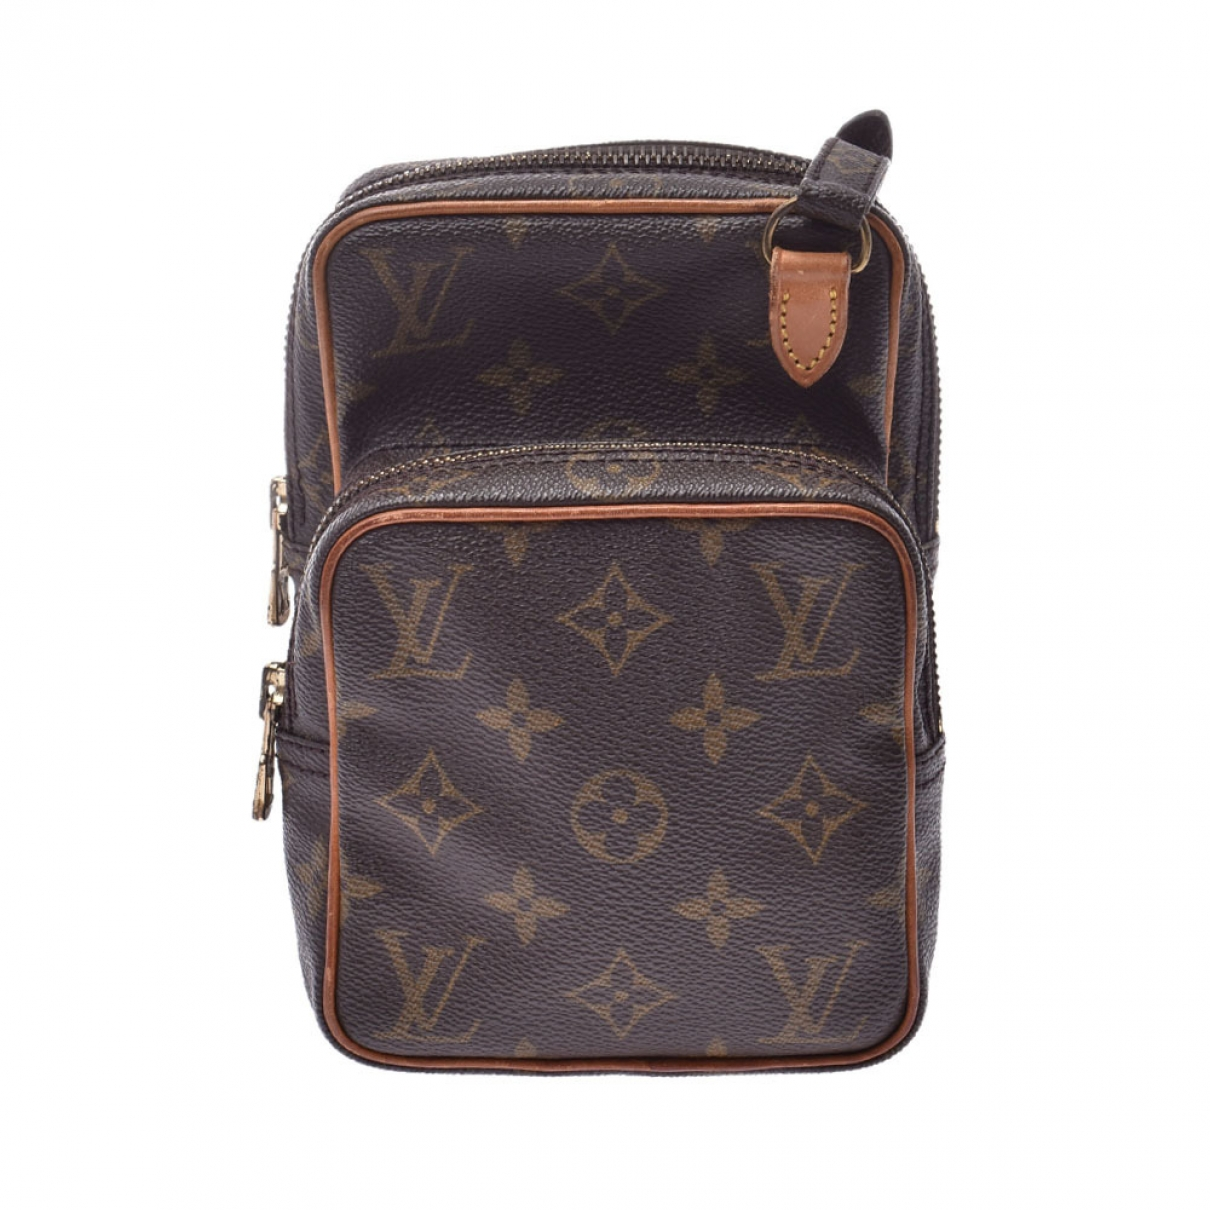 Pochette Amazon de Lona Louis Vuitton